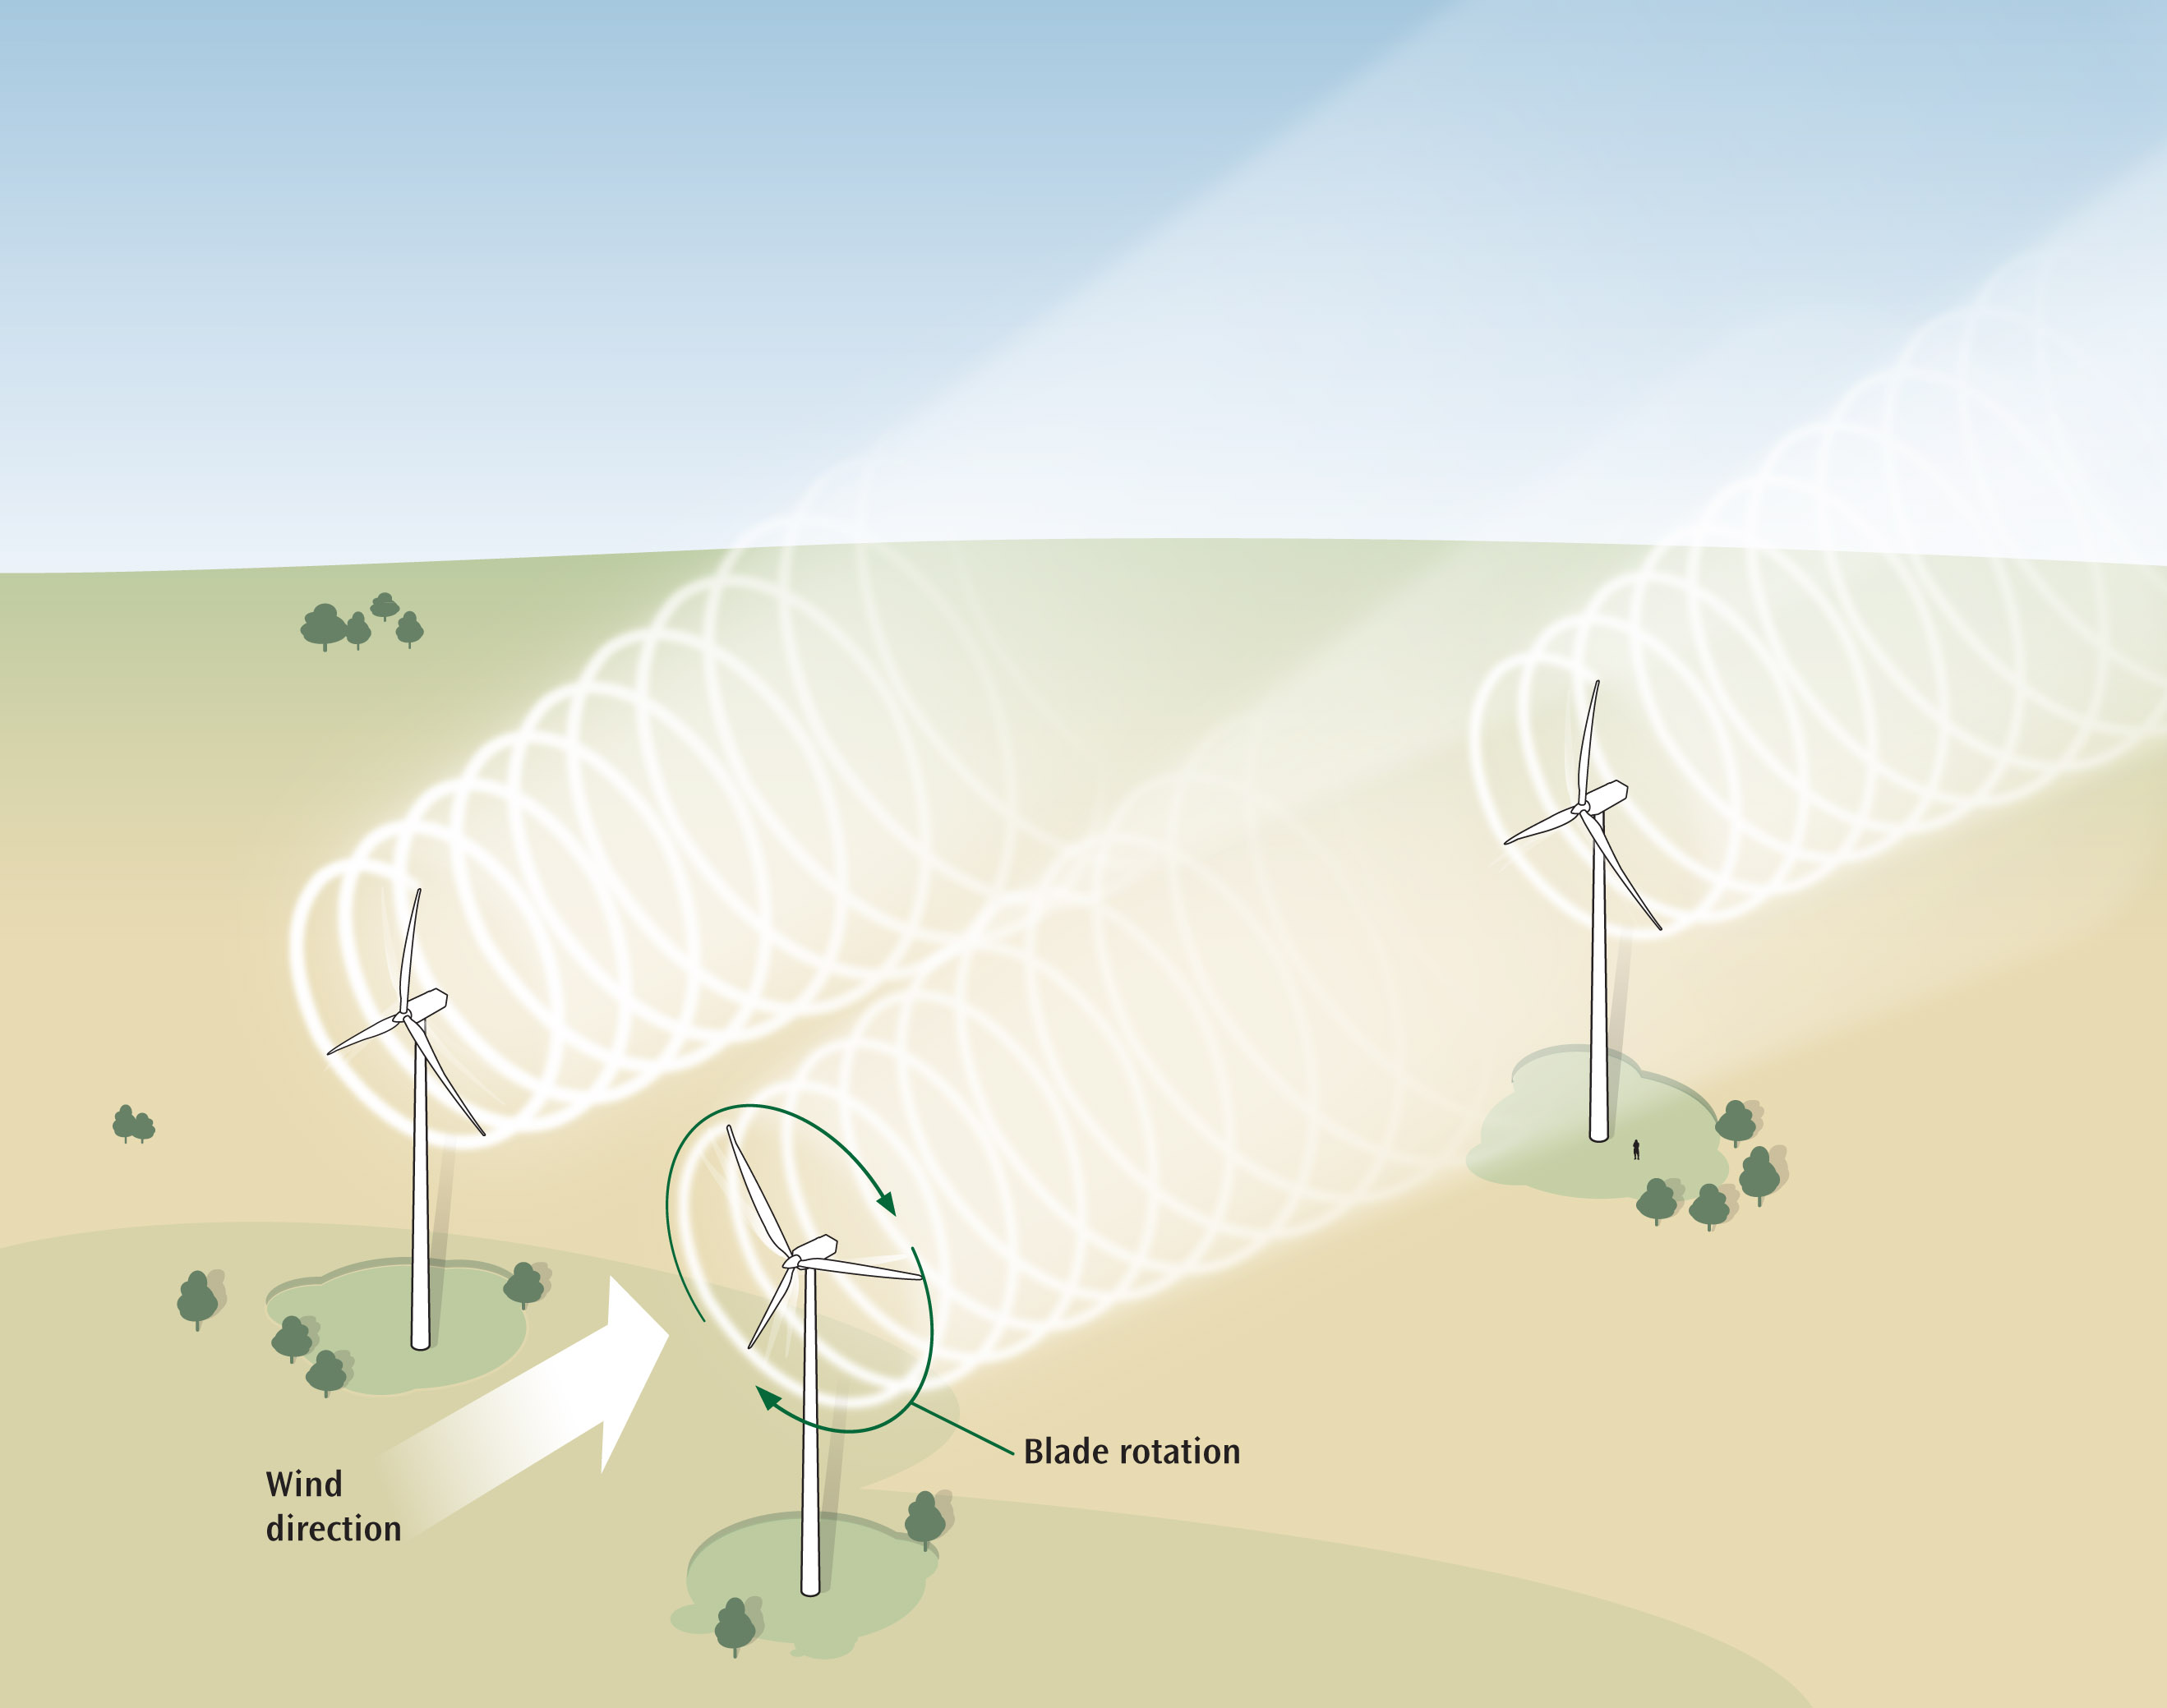 Vestas to Install Research Wind Turbine at Sandia Facility in Texas